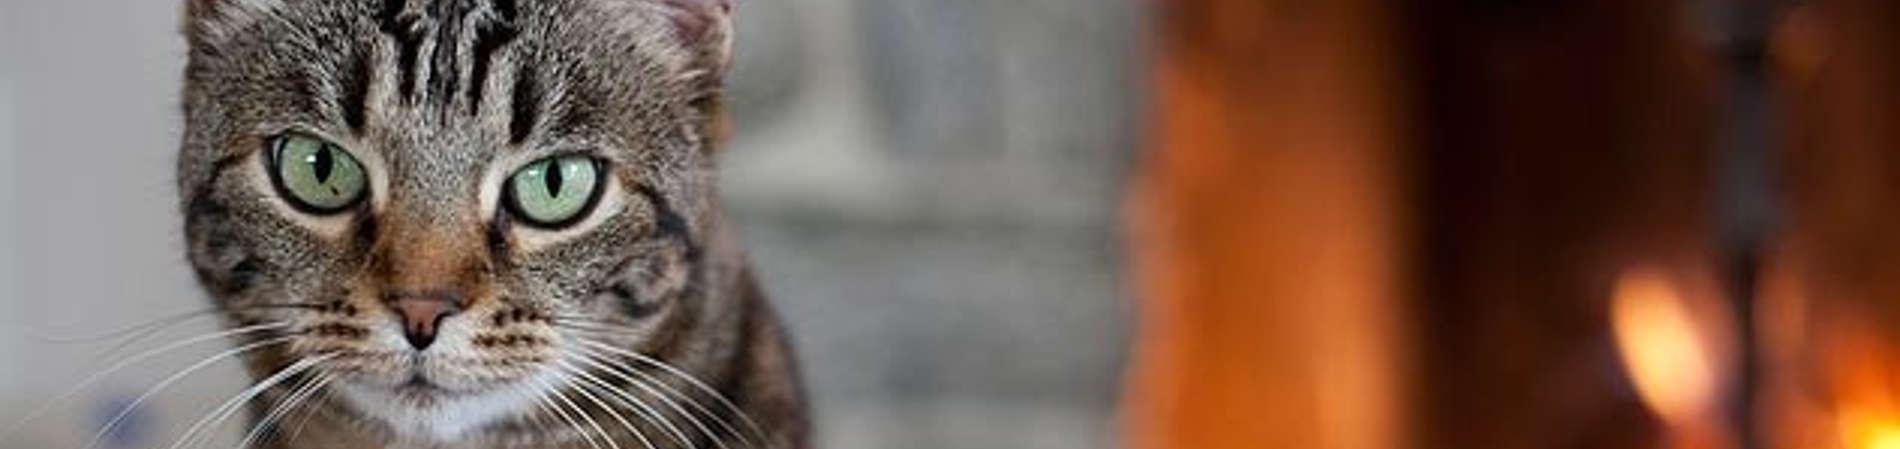 10 Mejores Guarderías para Gatos | Precios - Cronoshare